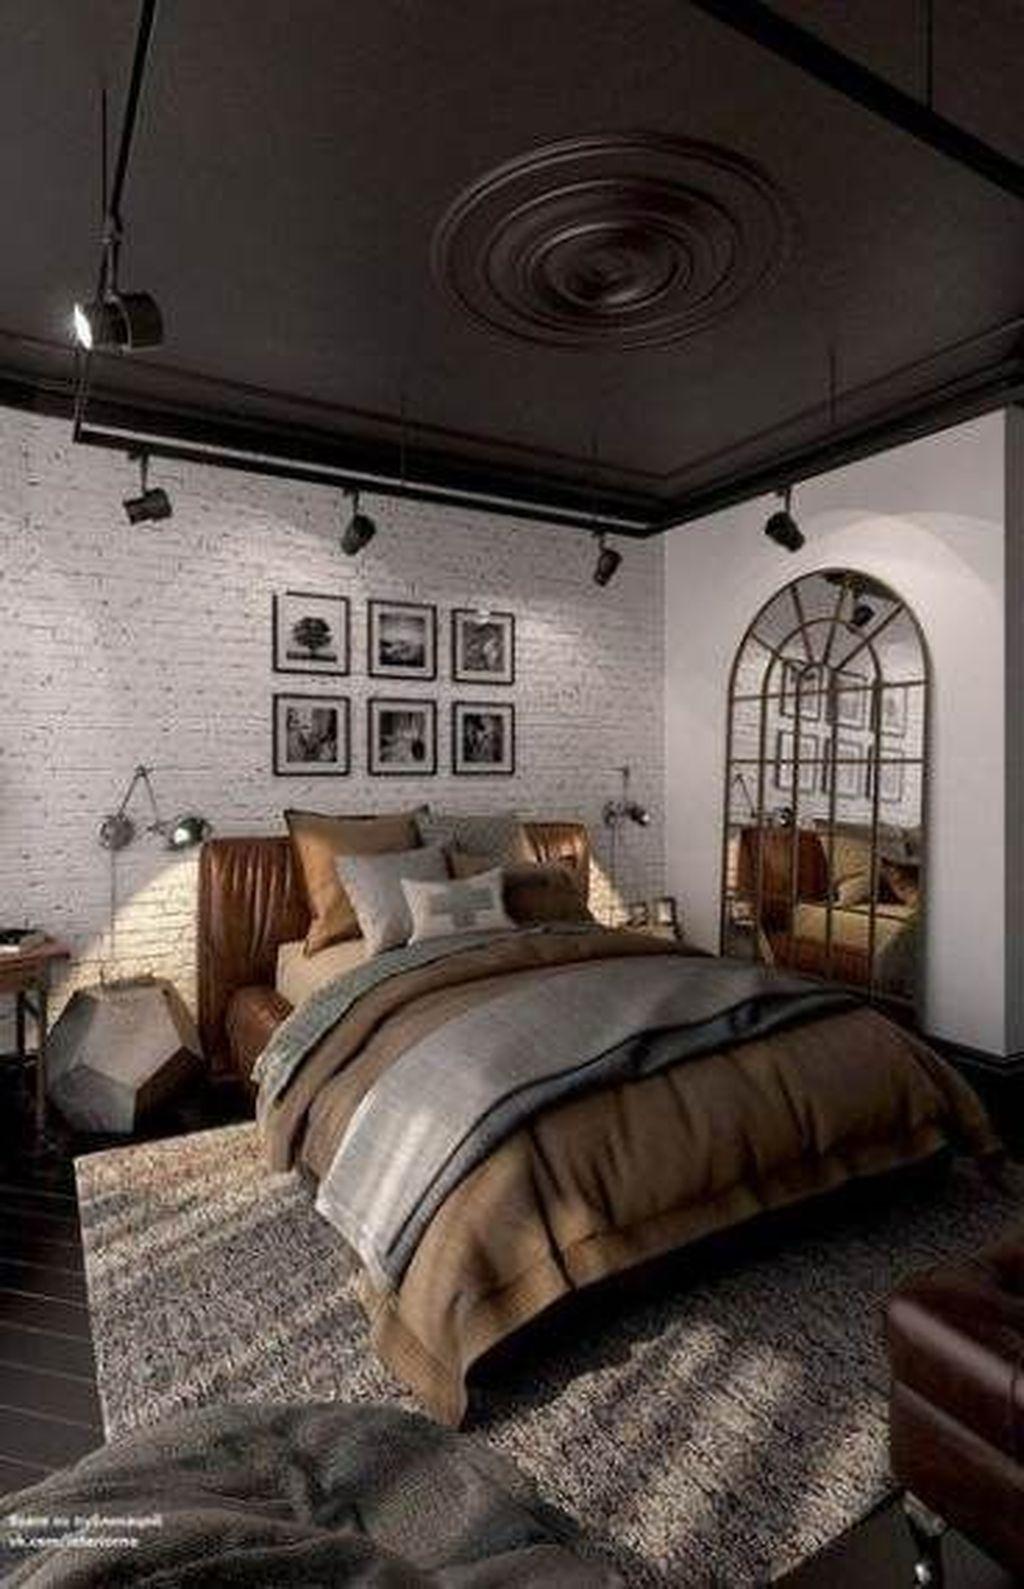 20 Modern Style For Industrial Bedroom Design Ideas Industrial Decor Bedroom Industrial Bedroom Design Modern Bedroom Men's industrial bedroom ideas